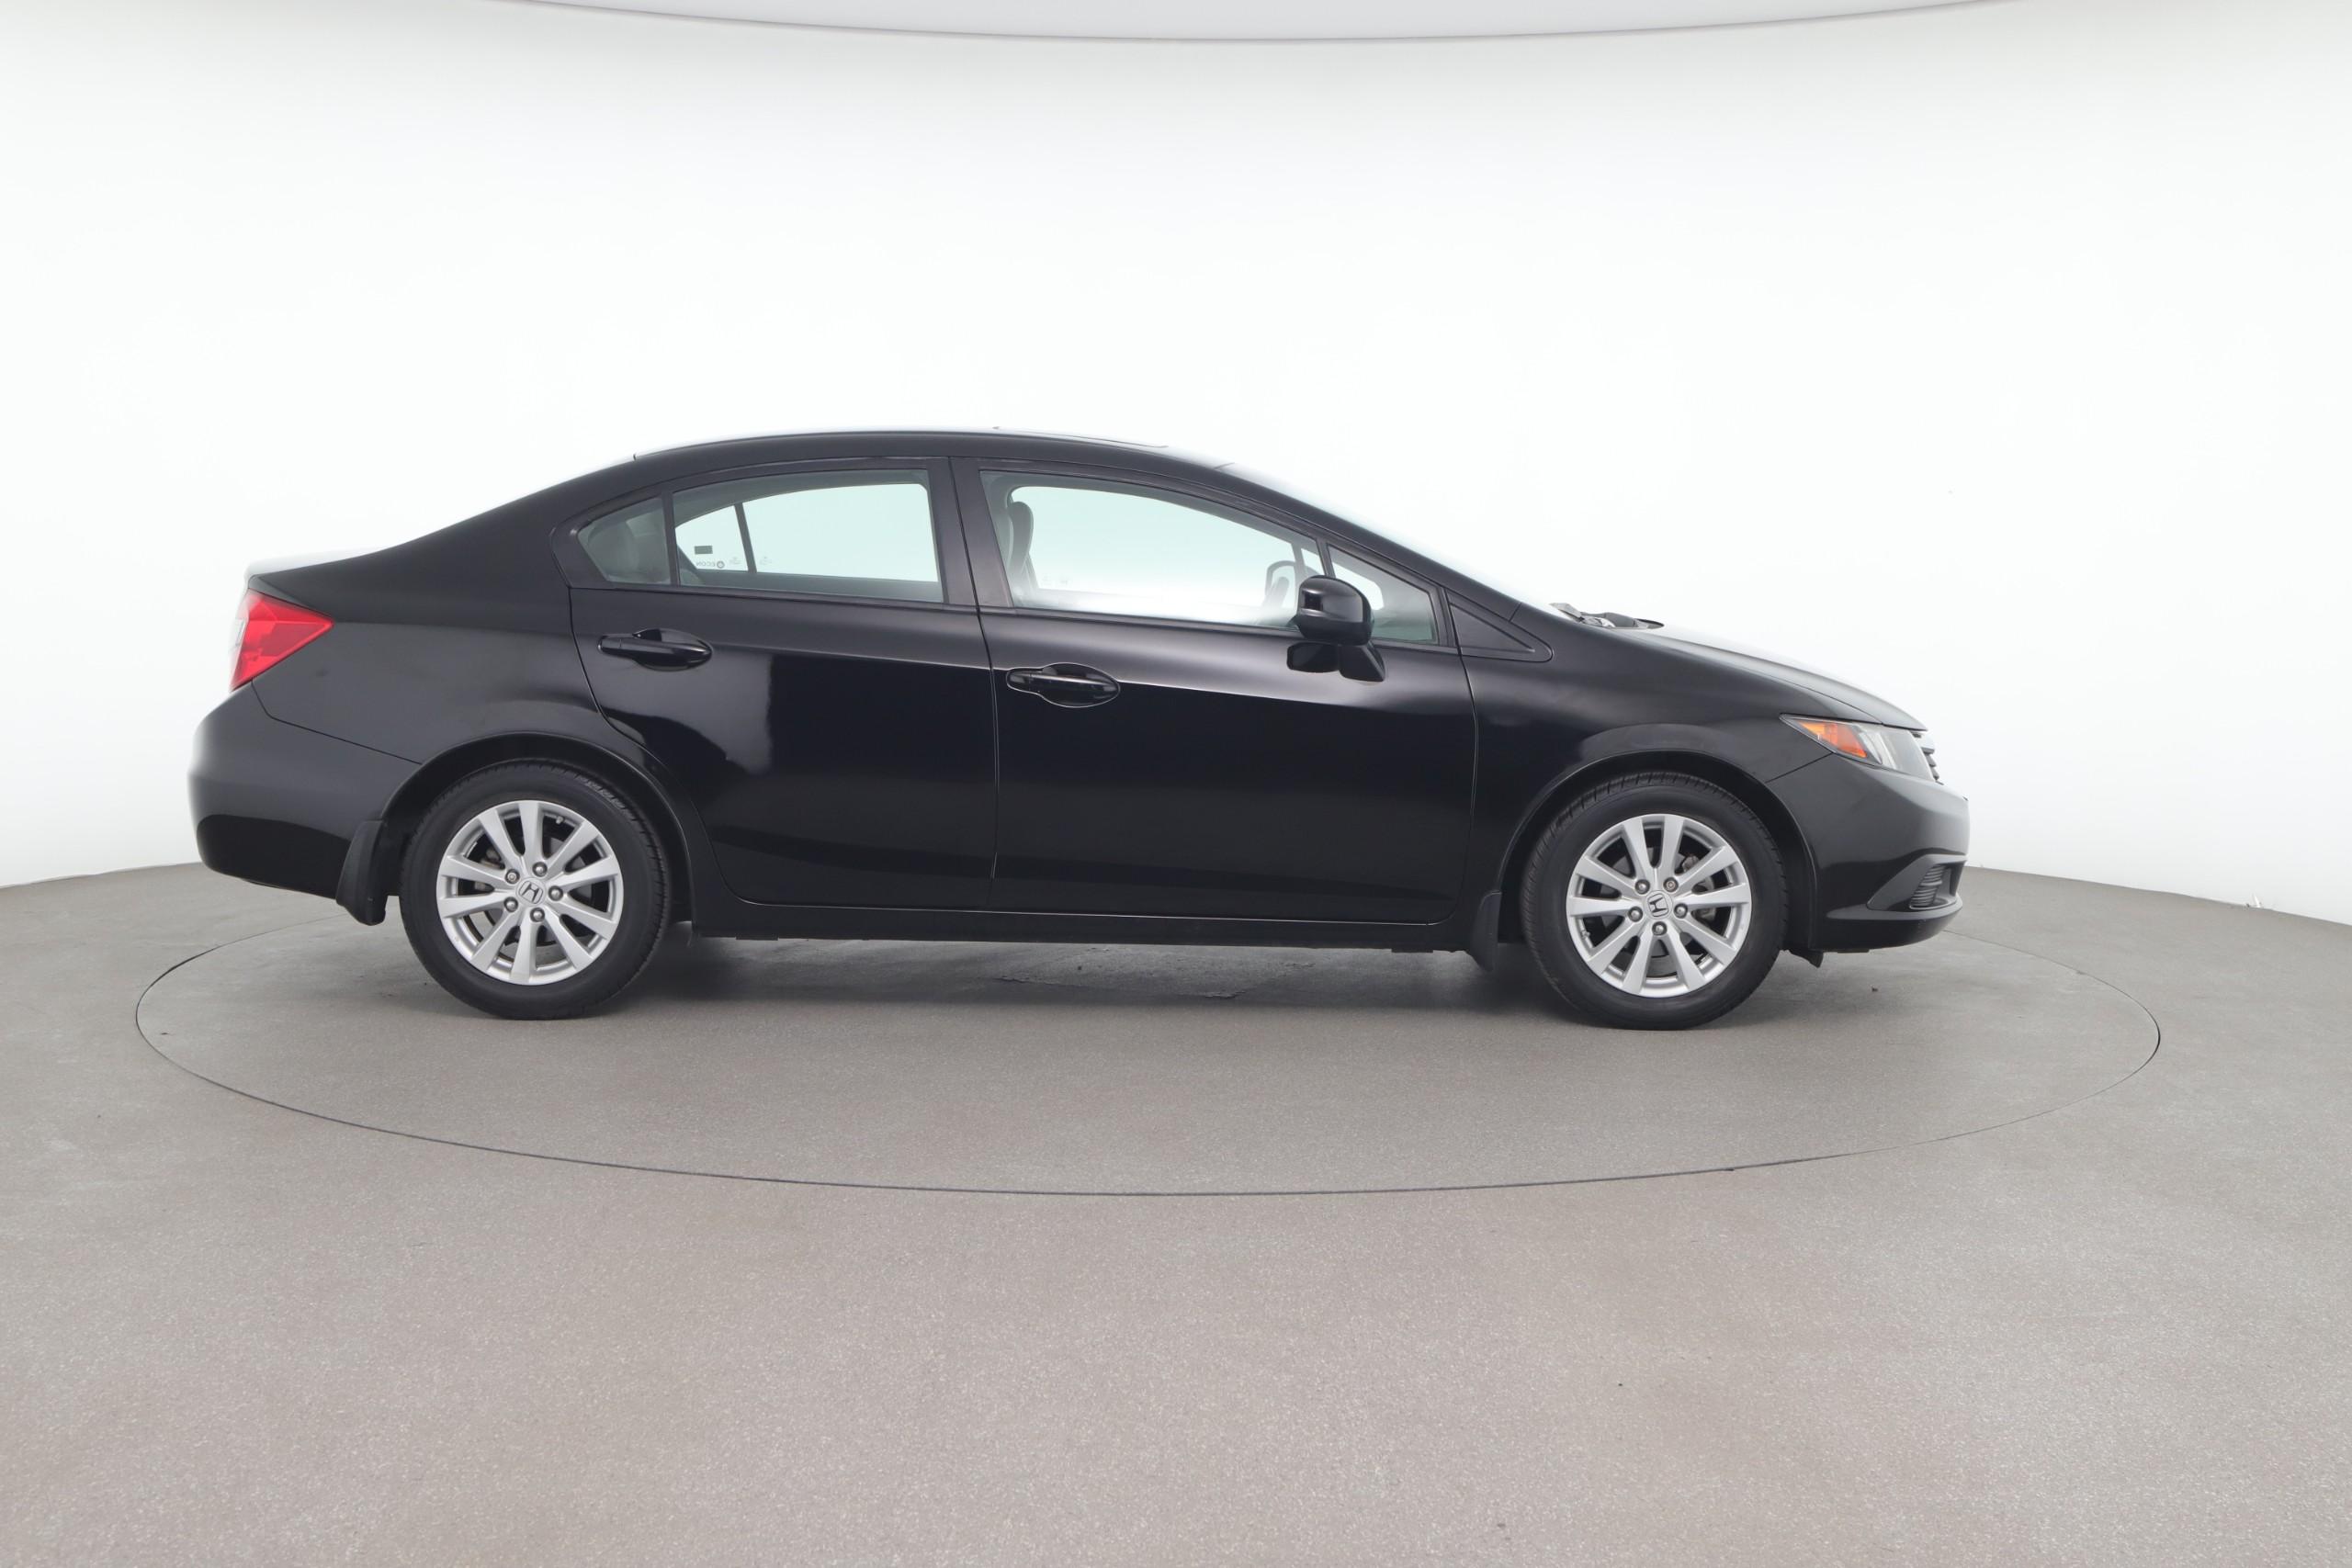 Honda Civic: Review, Specs & Prices